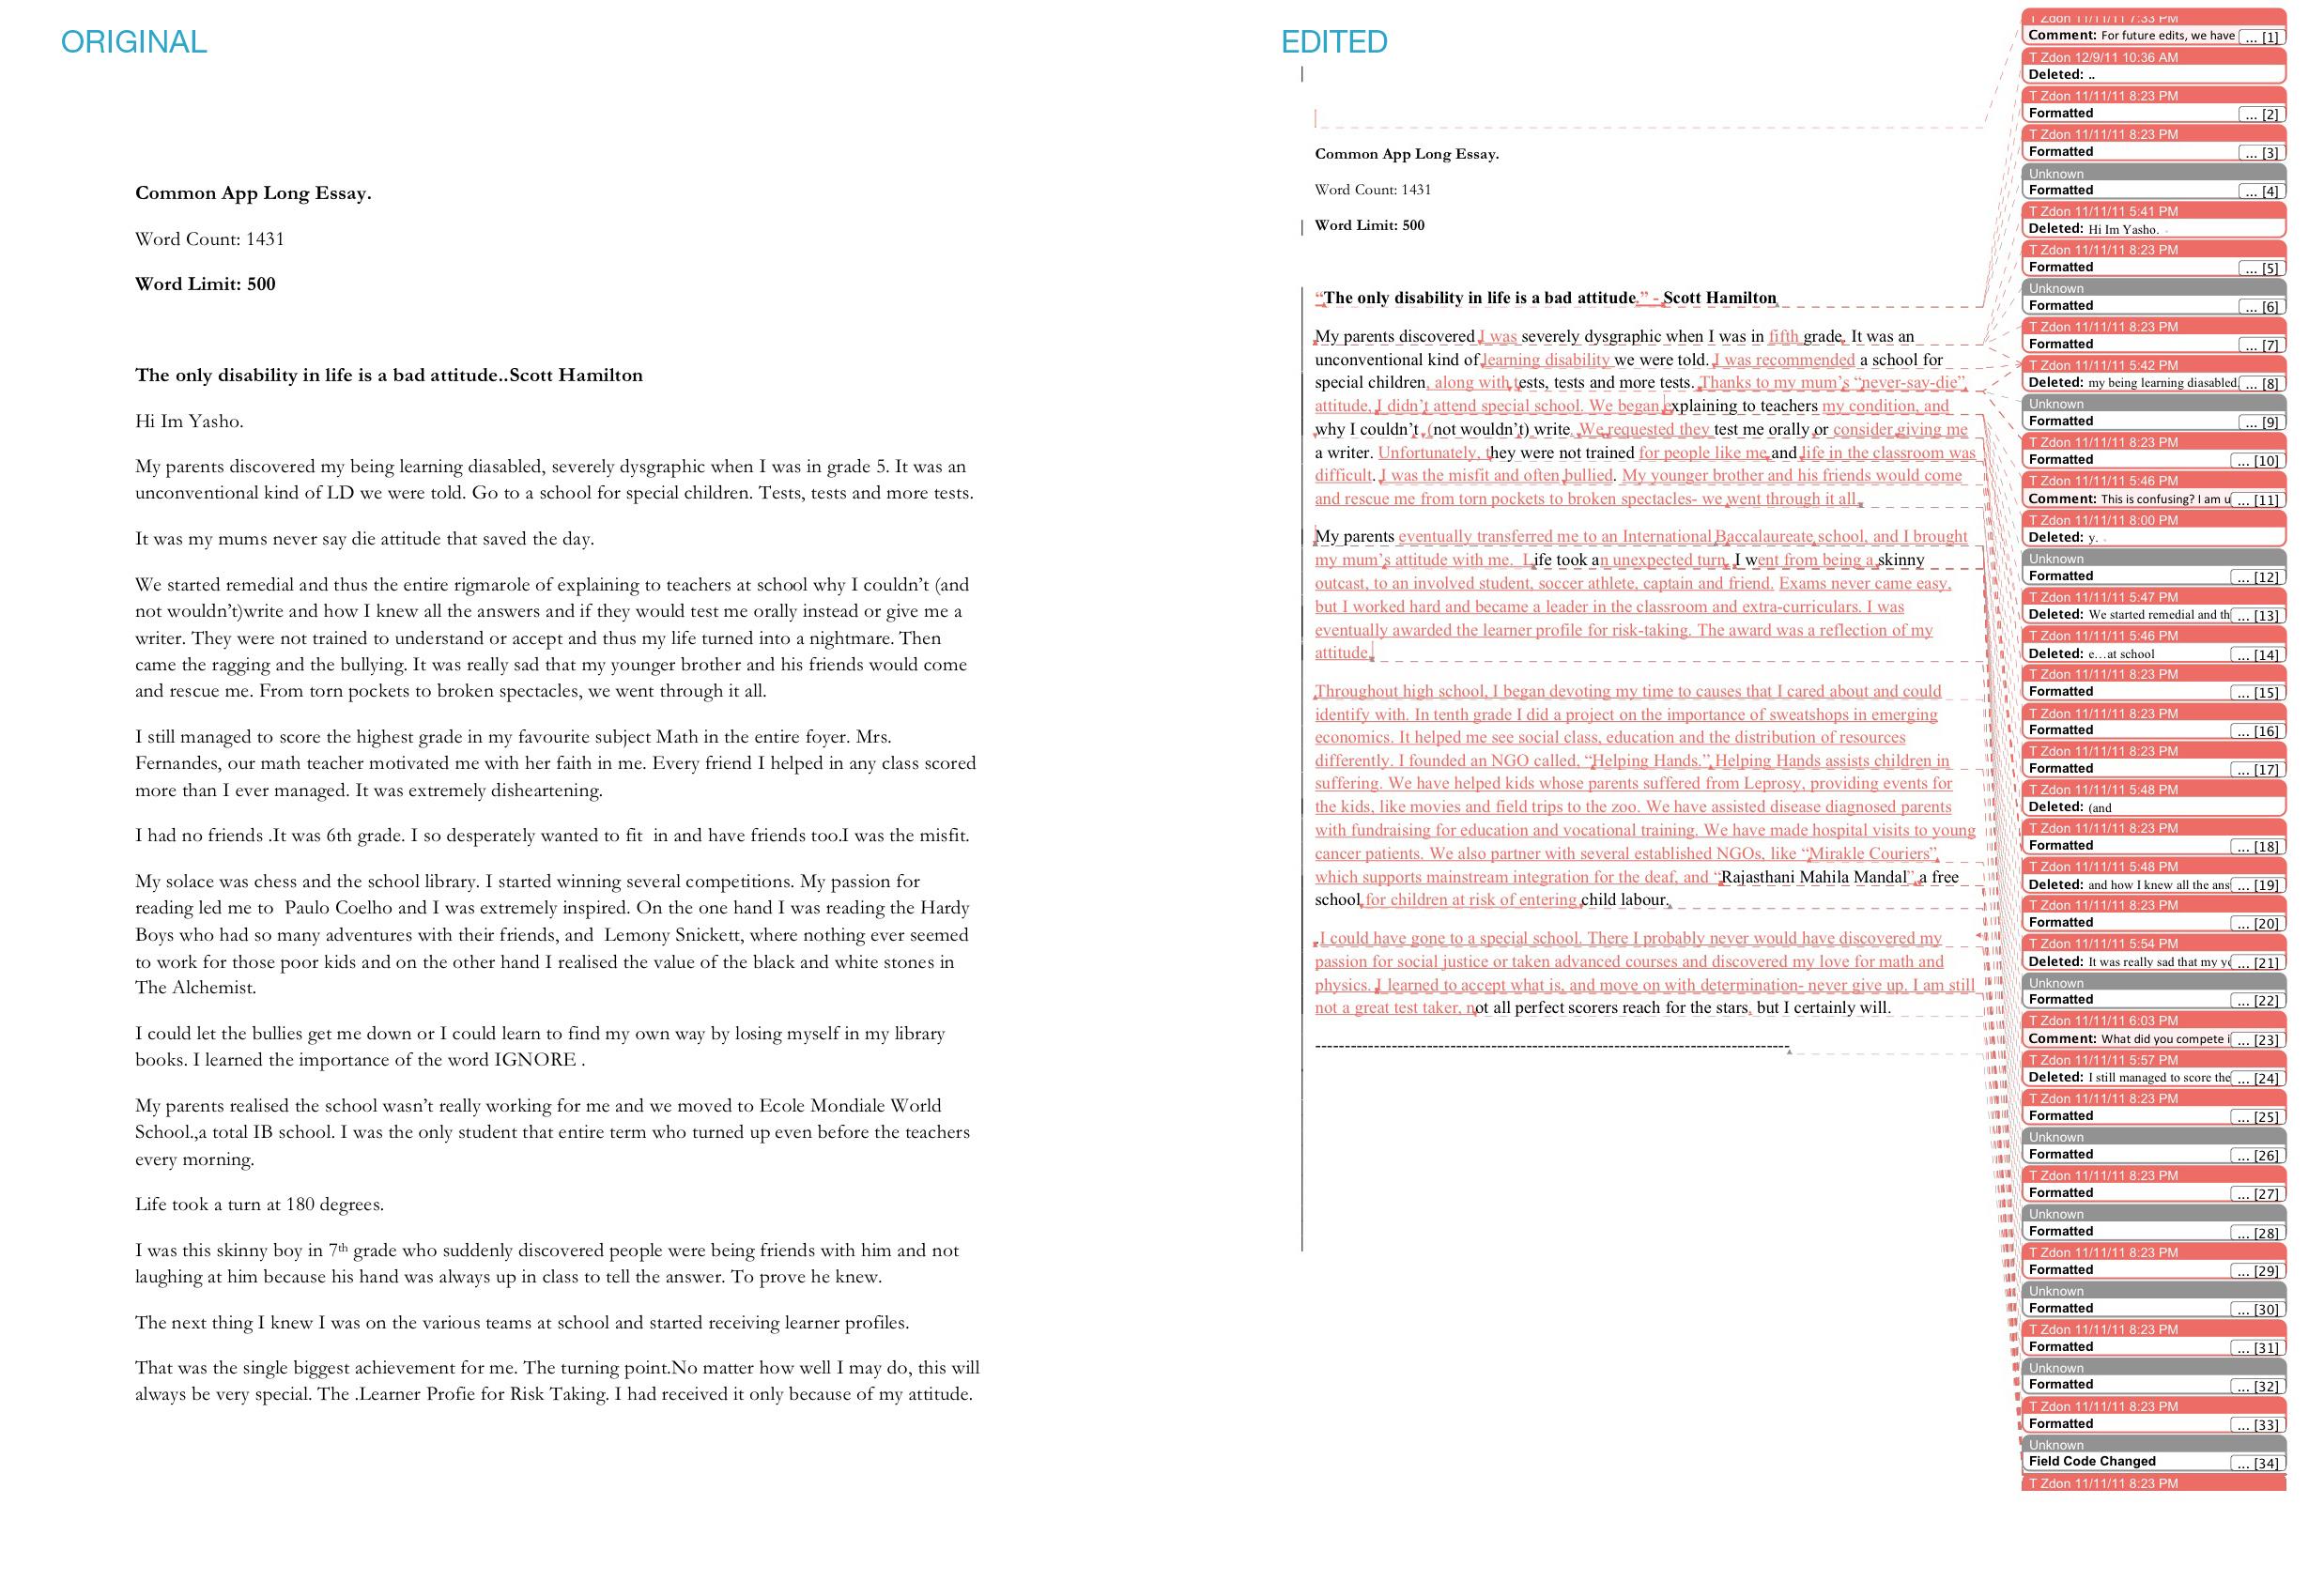 012 Common App Essay Questions Application Dreaded 2017 2017-18 Full